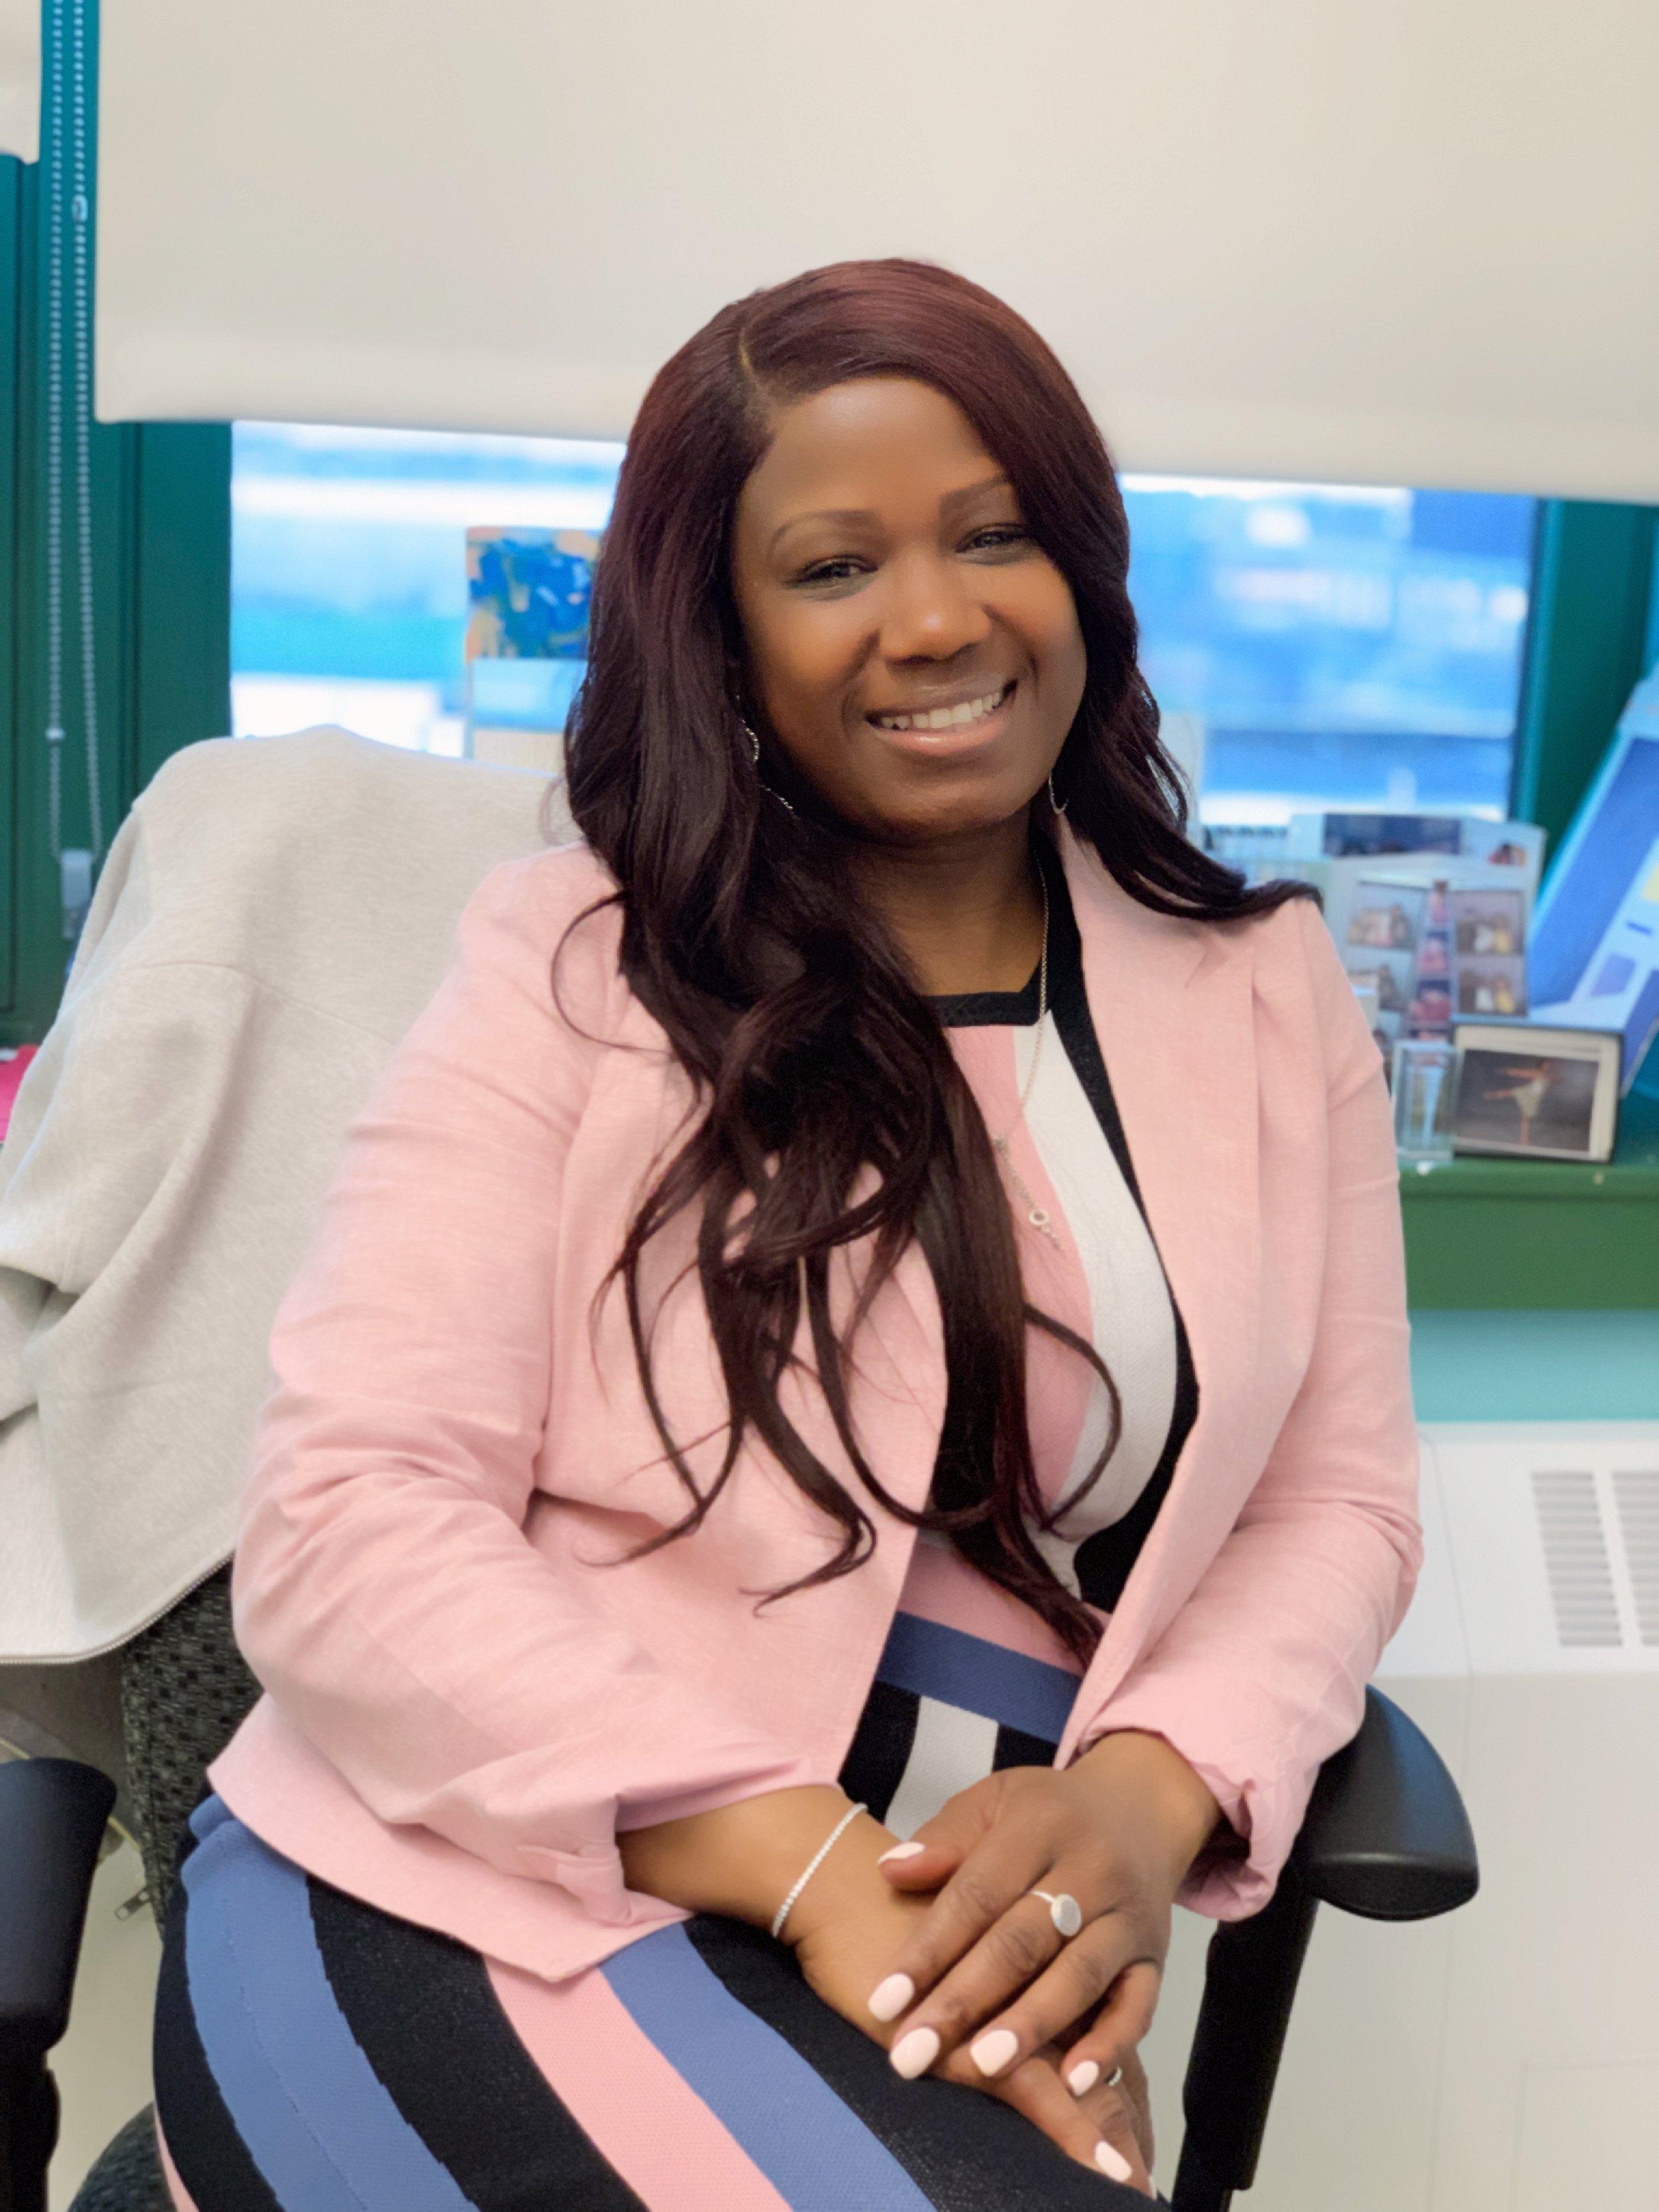 TANISHA BROWN - HIGH SCHOOL ASSISTANT PRINCIPAL